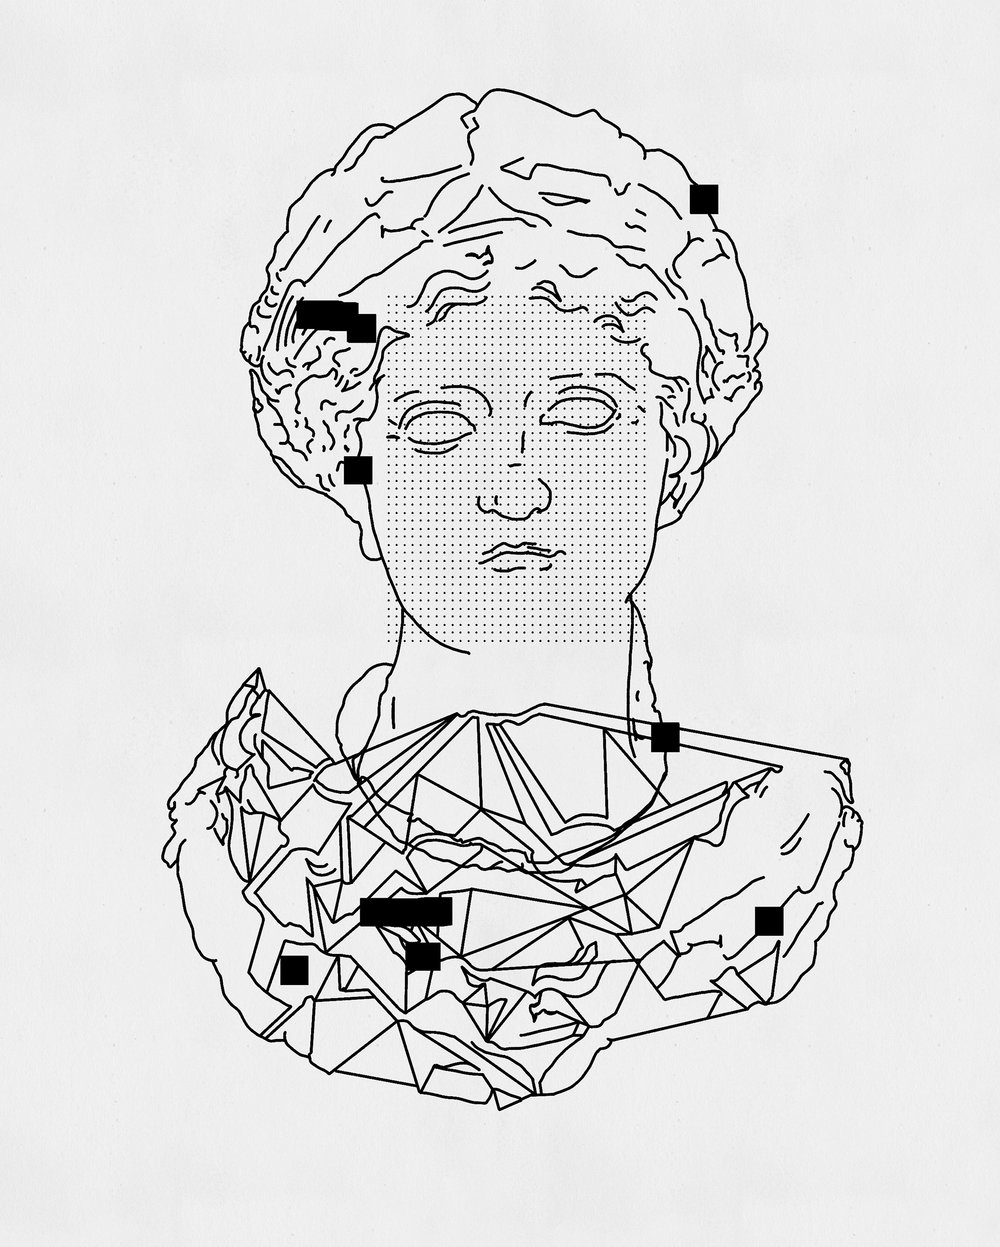 %22Velo%22 - 25 x 20 cm - Fine art print sobre papel - Julián Brangold - 2018.jpg